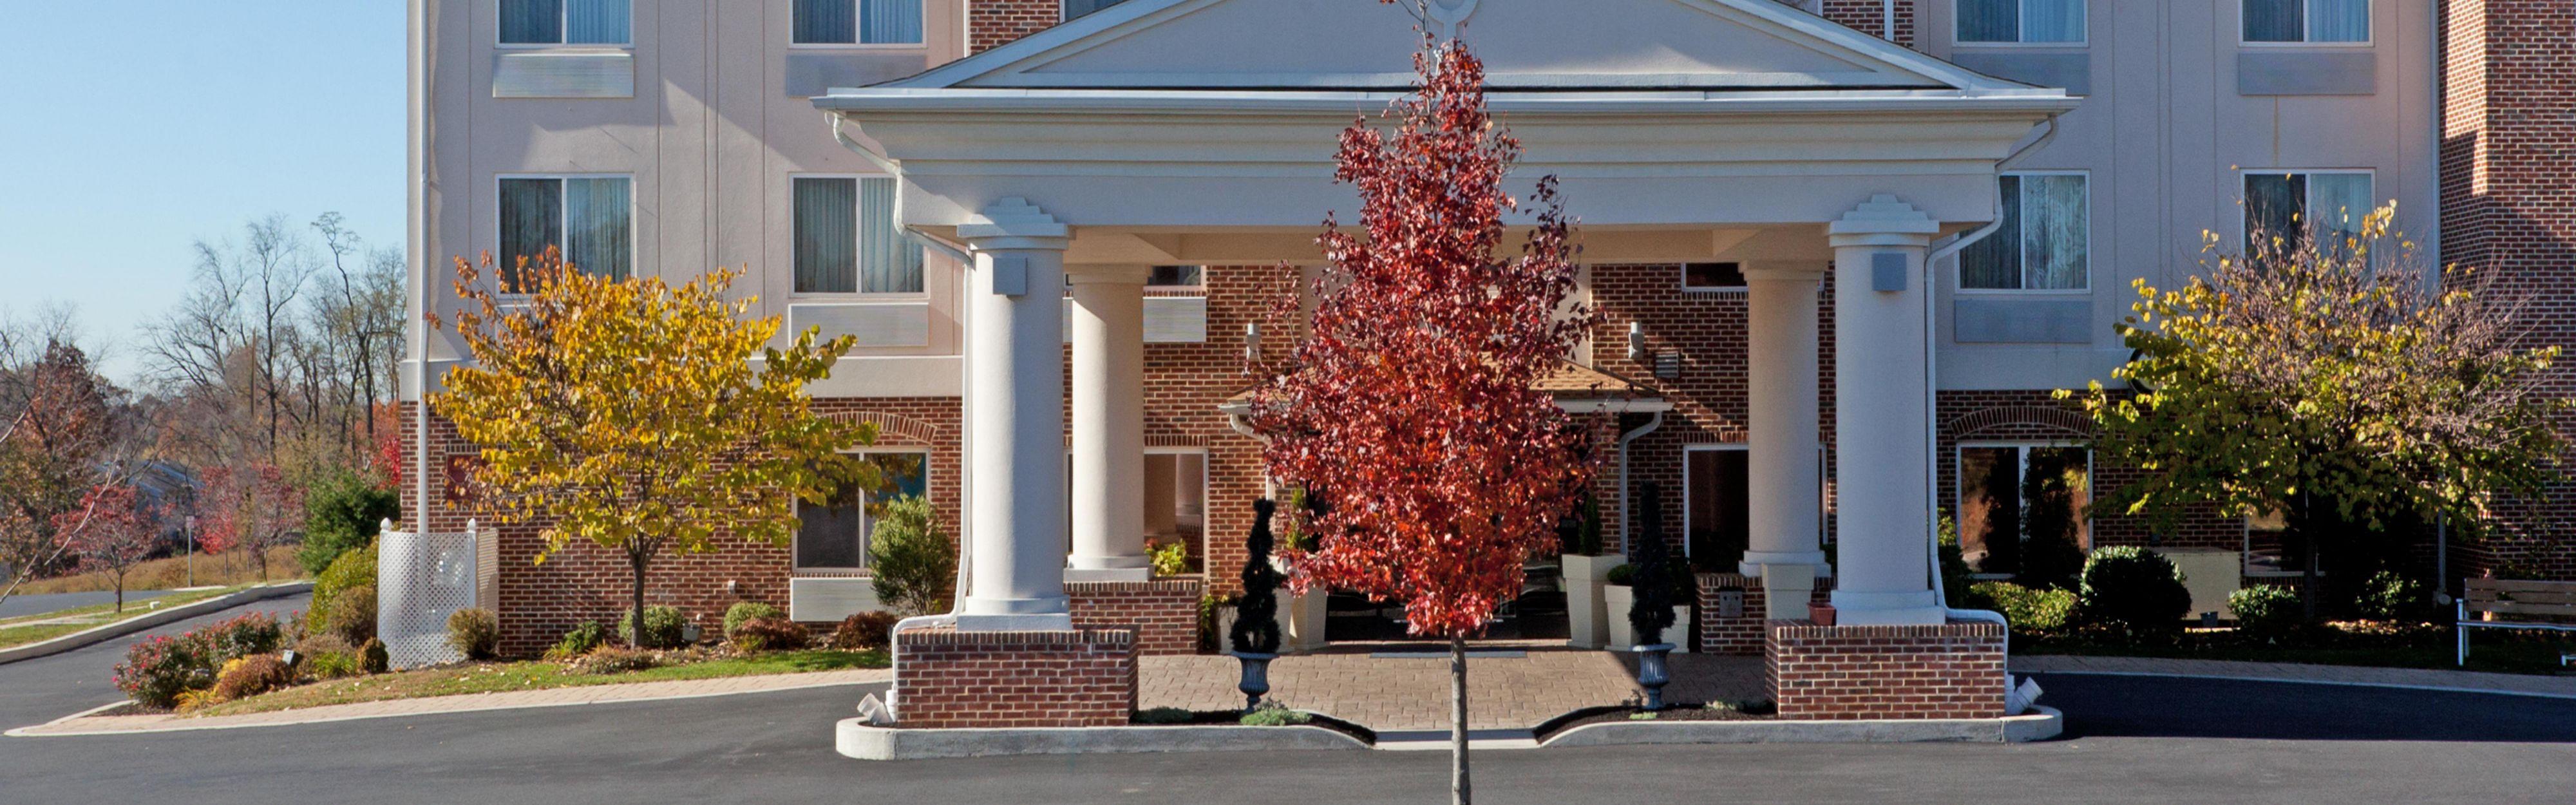 Holiday Inn Express & Suites Lancaster-Lititz image 0